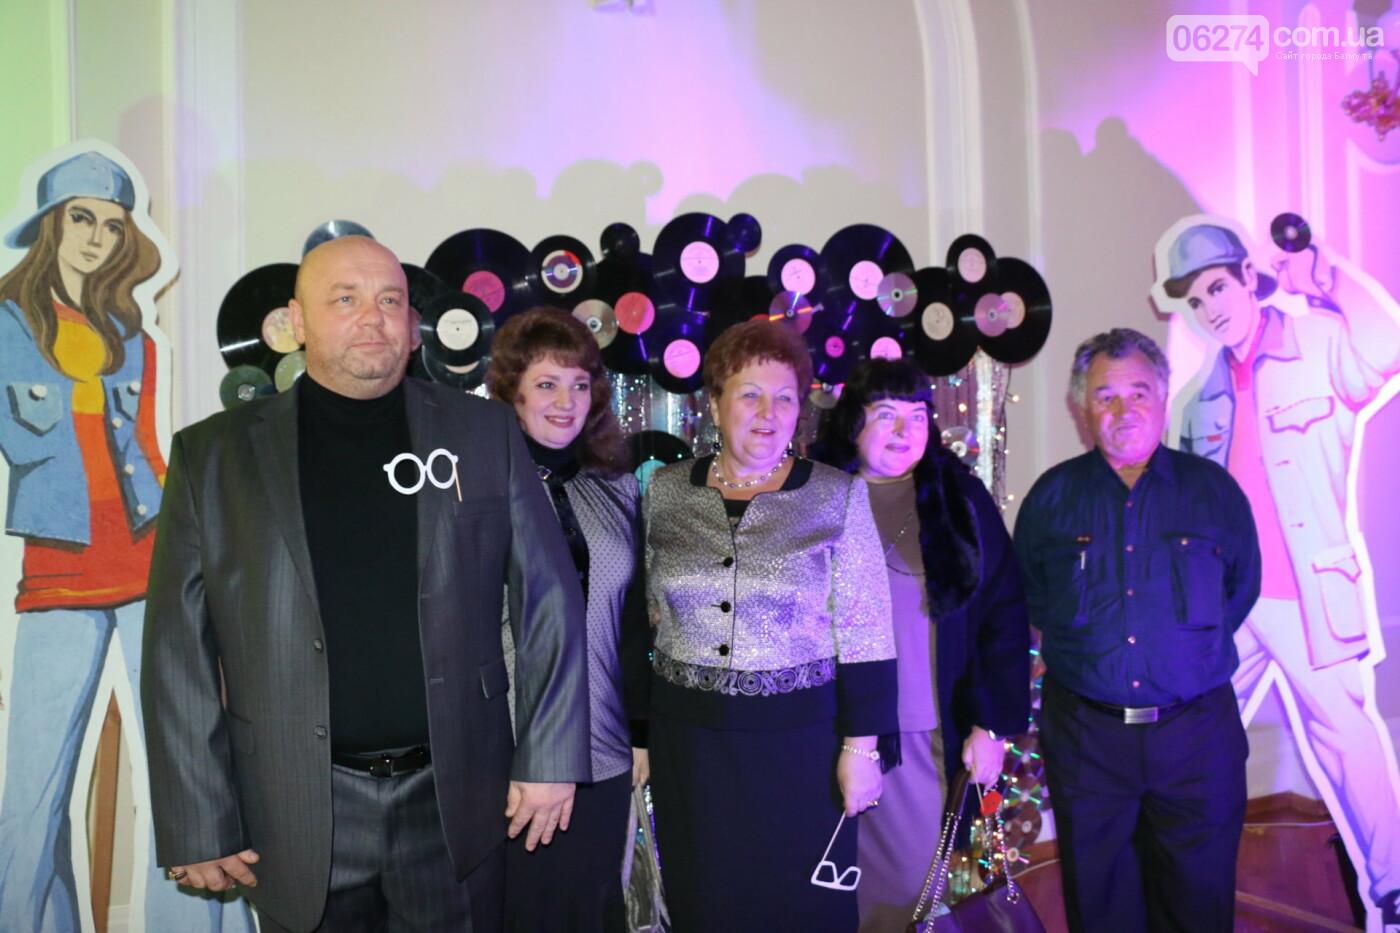 В Бахмуте провели Disco House Party (ФОТООТЧЕТ), фото-7